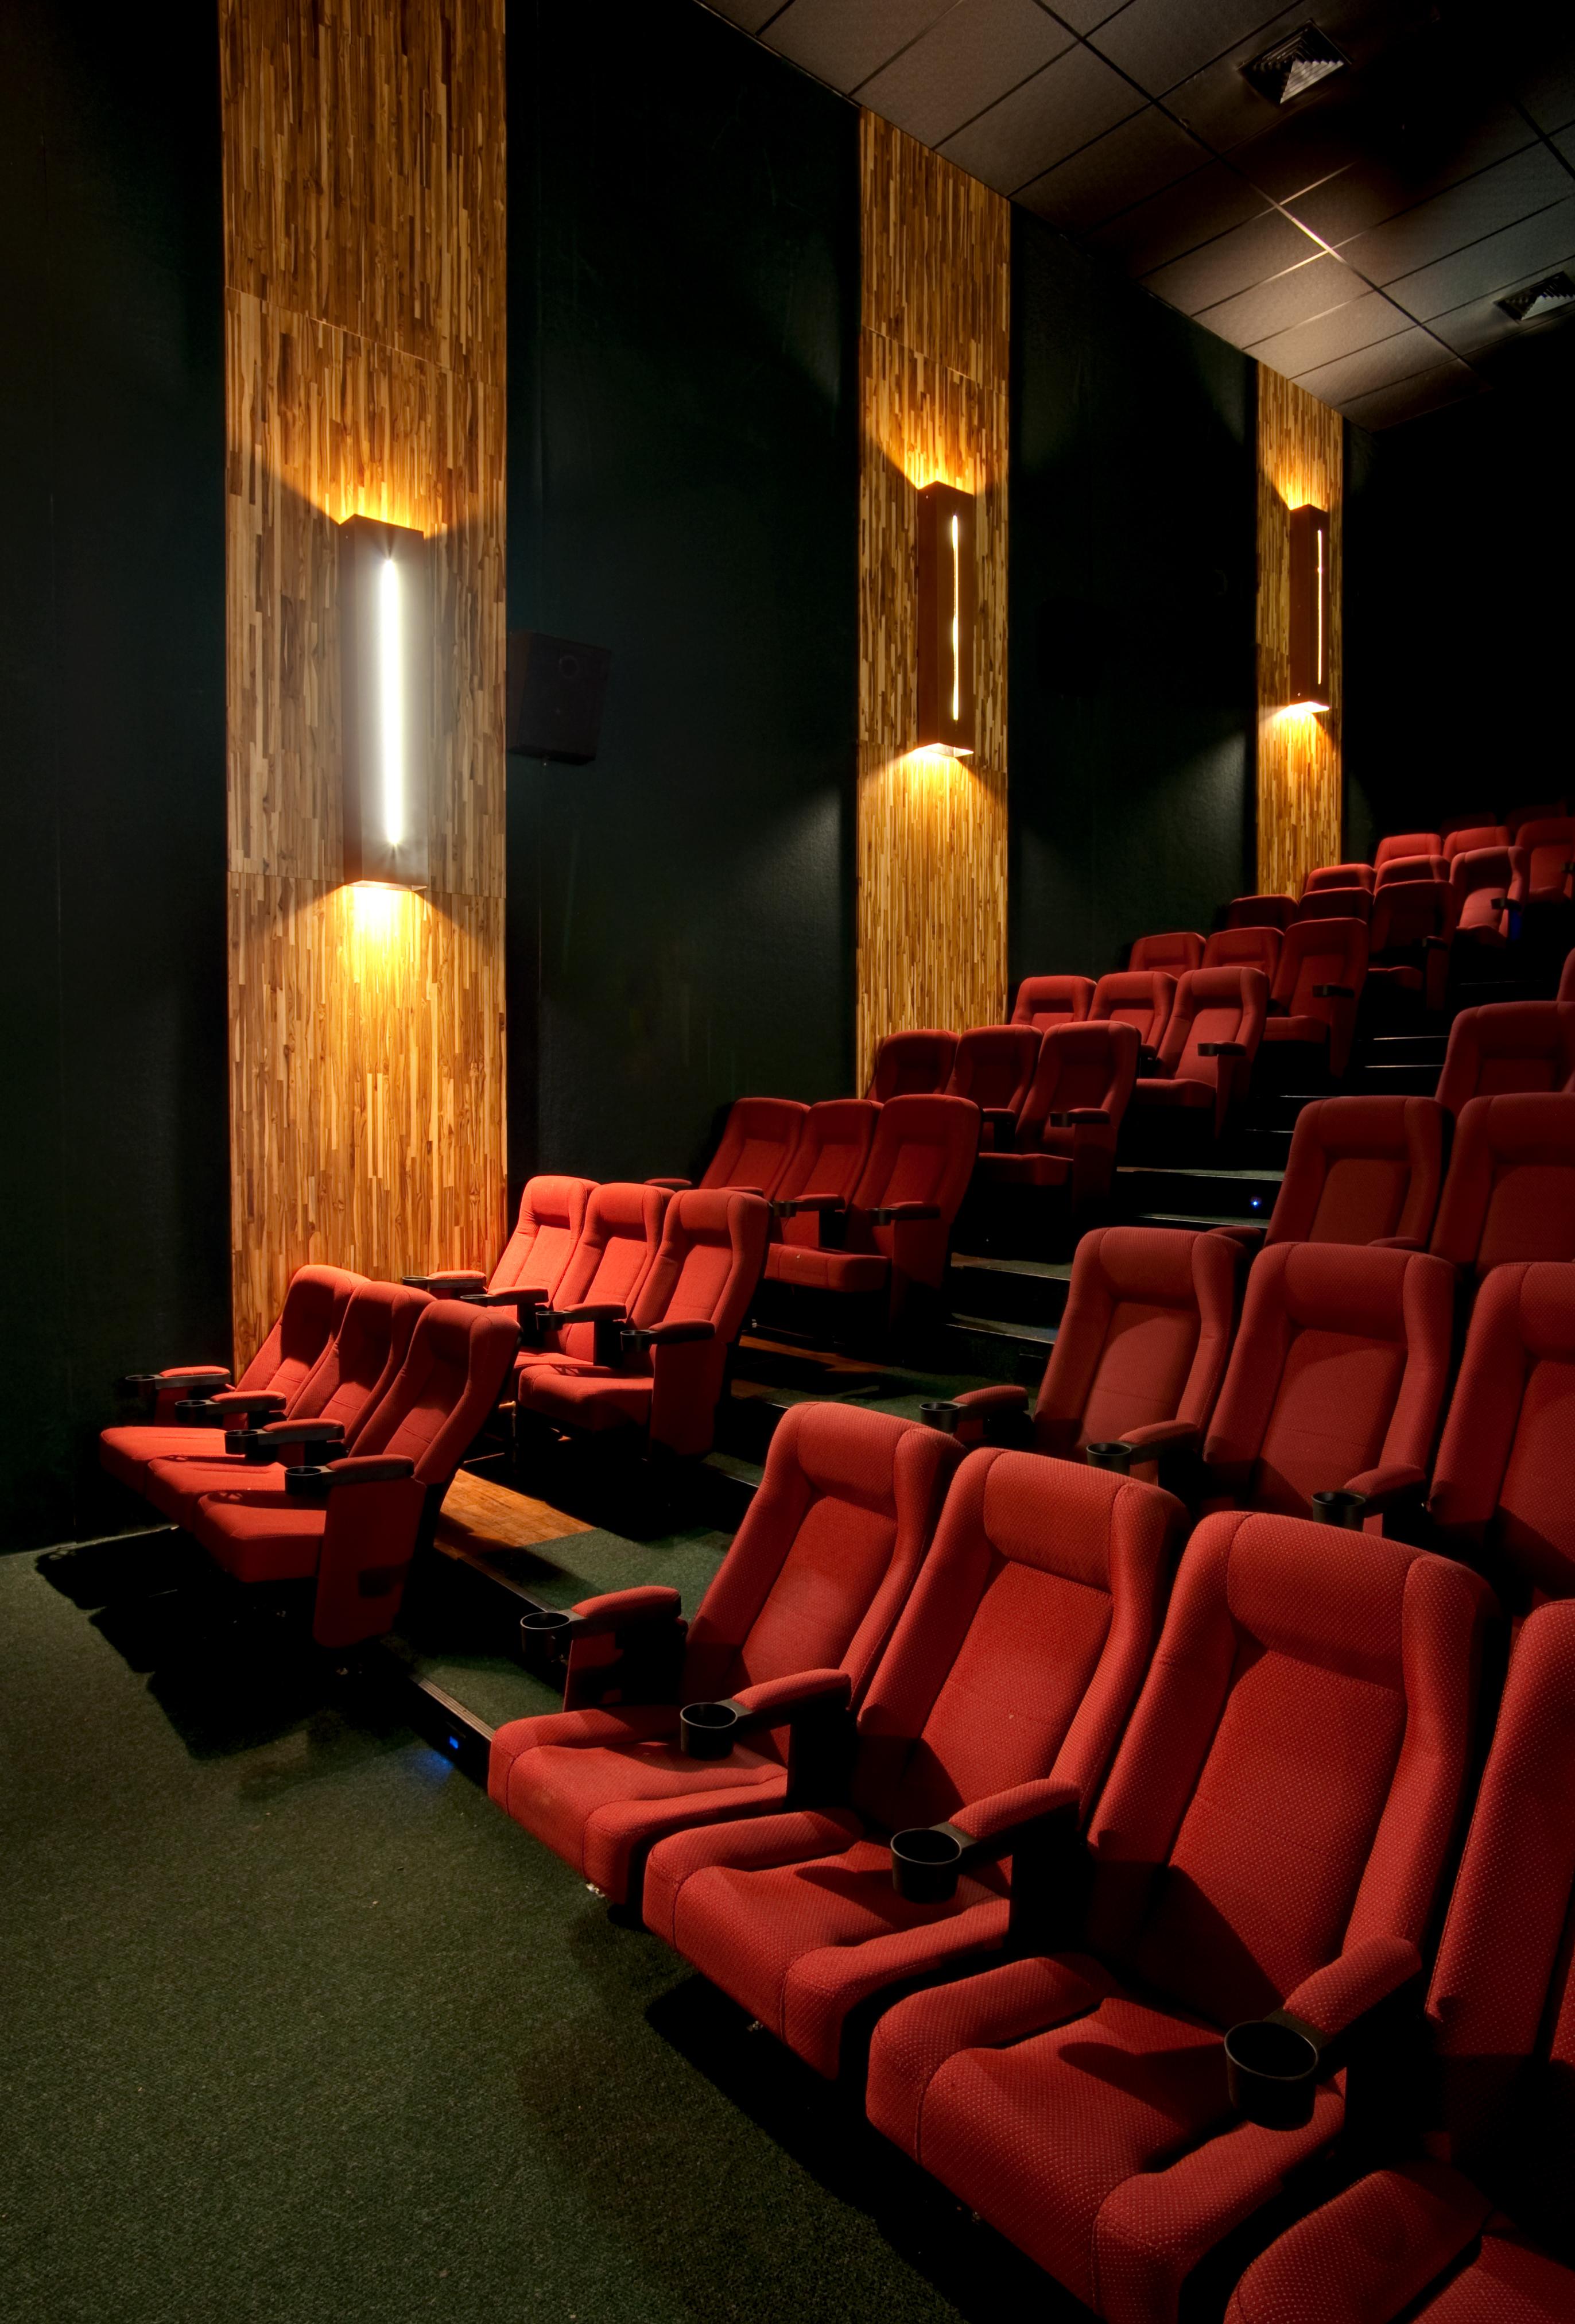 galeria de cinema lumiere bougainville dayala rafael. Black Bedroom Furniture Sets. Home Design Ideas